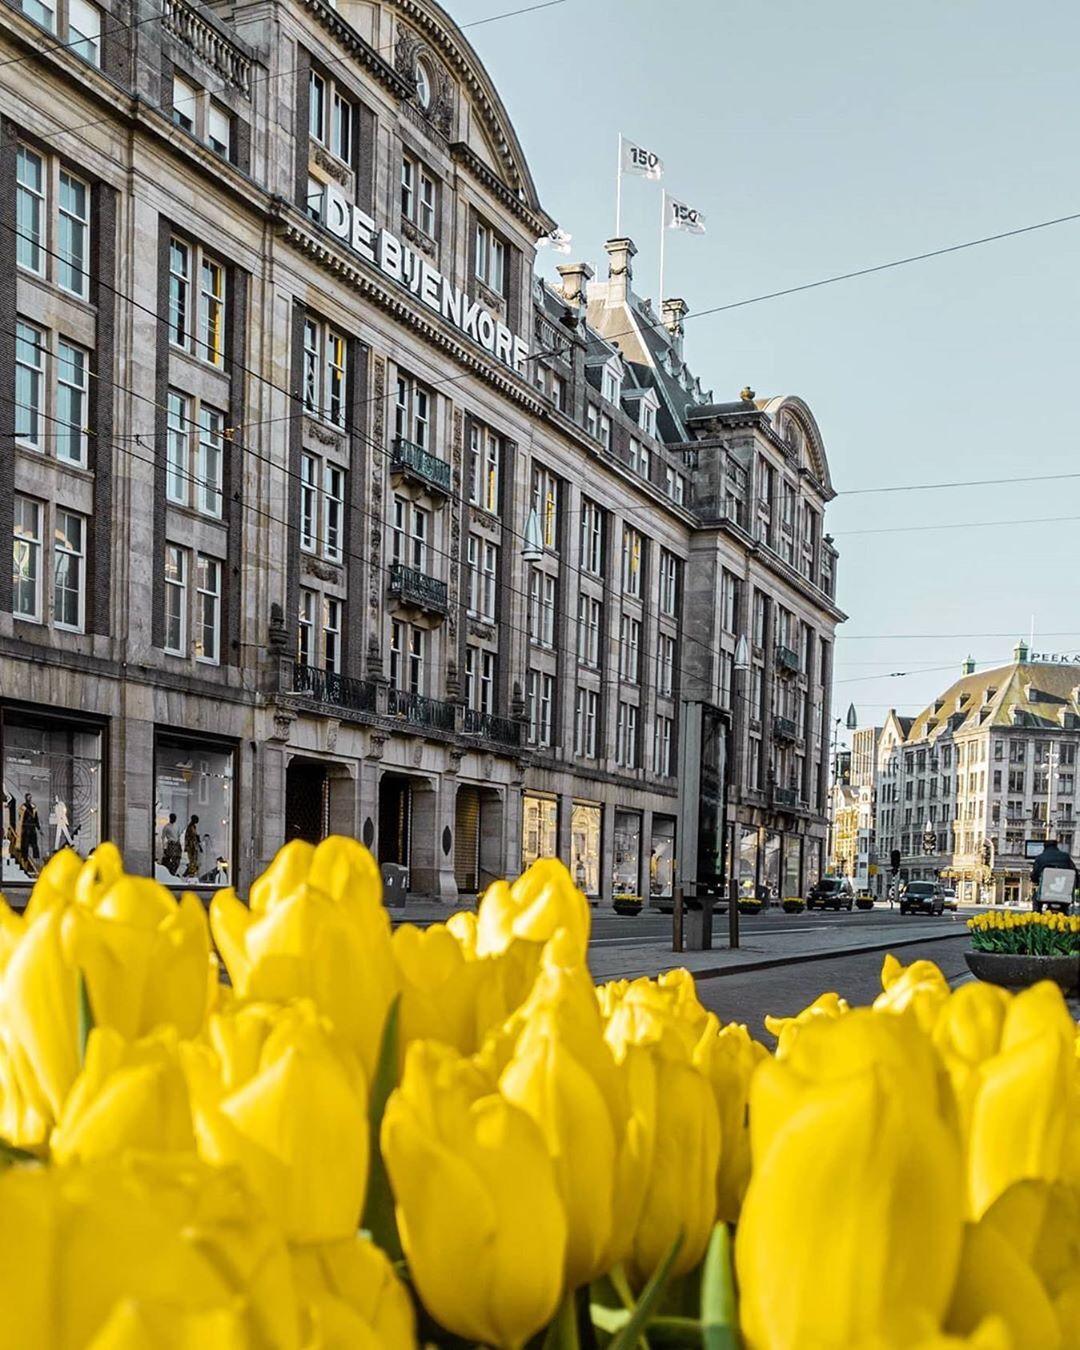 de Bijenkorf女王店阿姆办公室招聘市场营销及传播实习生